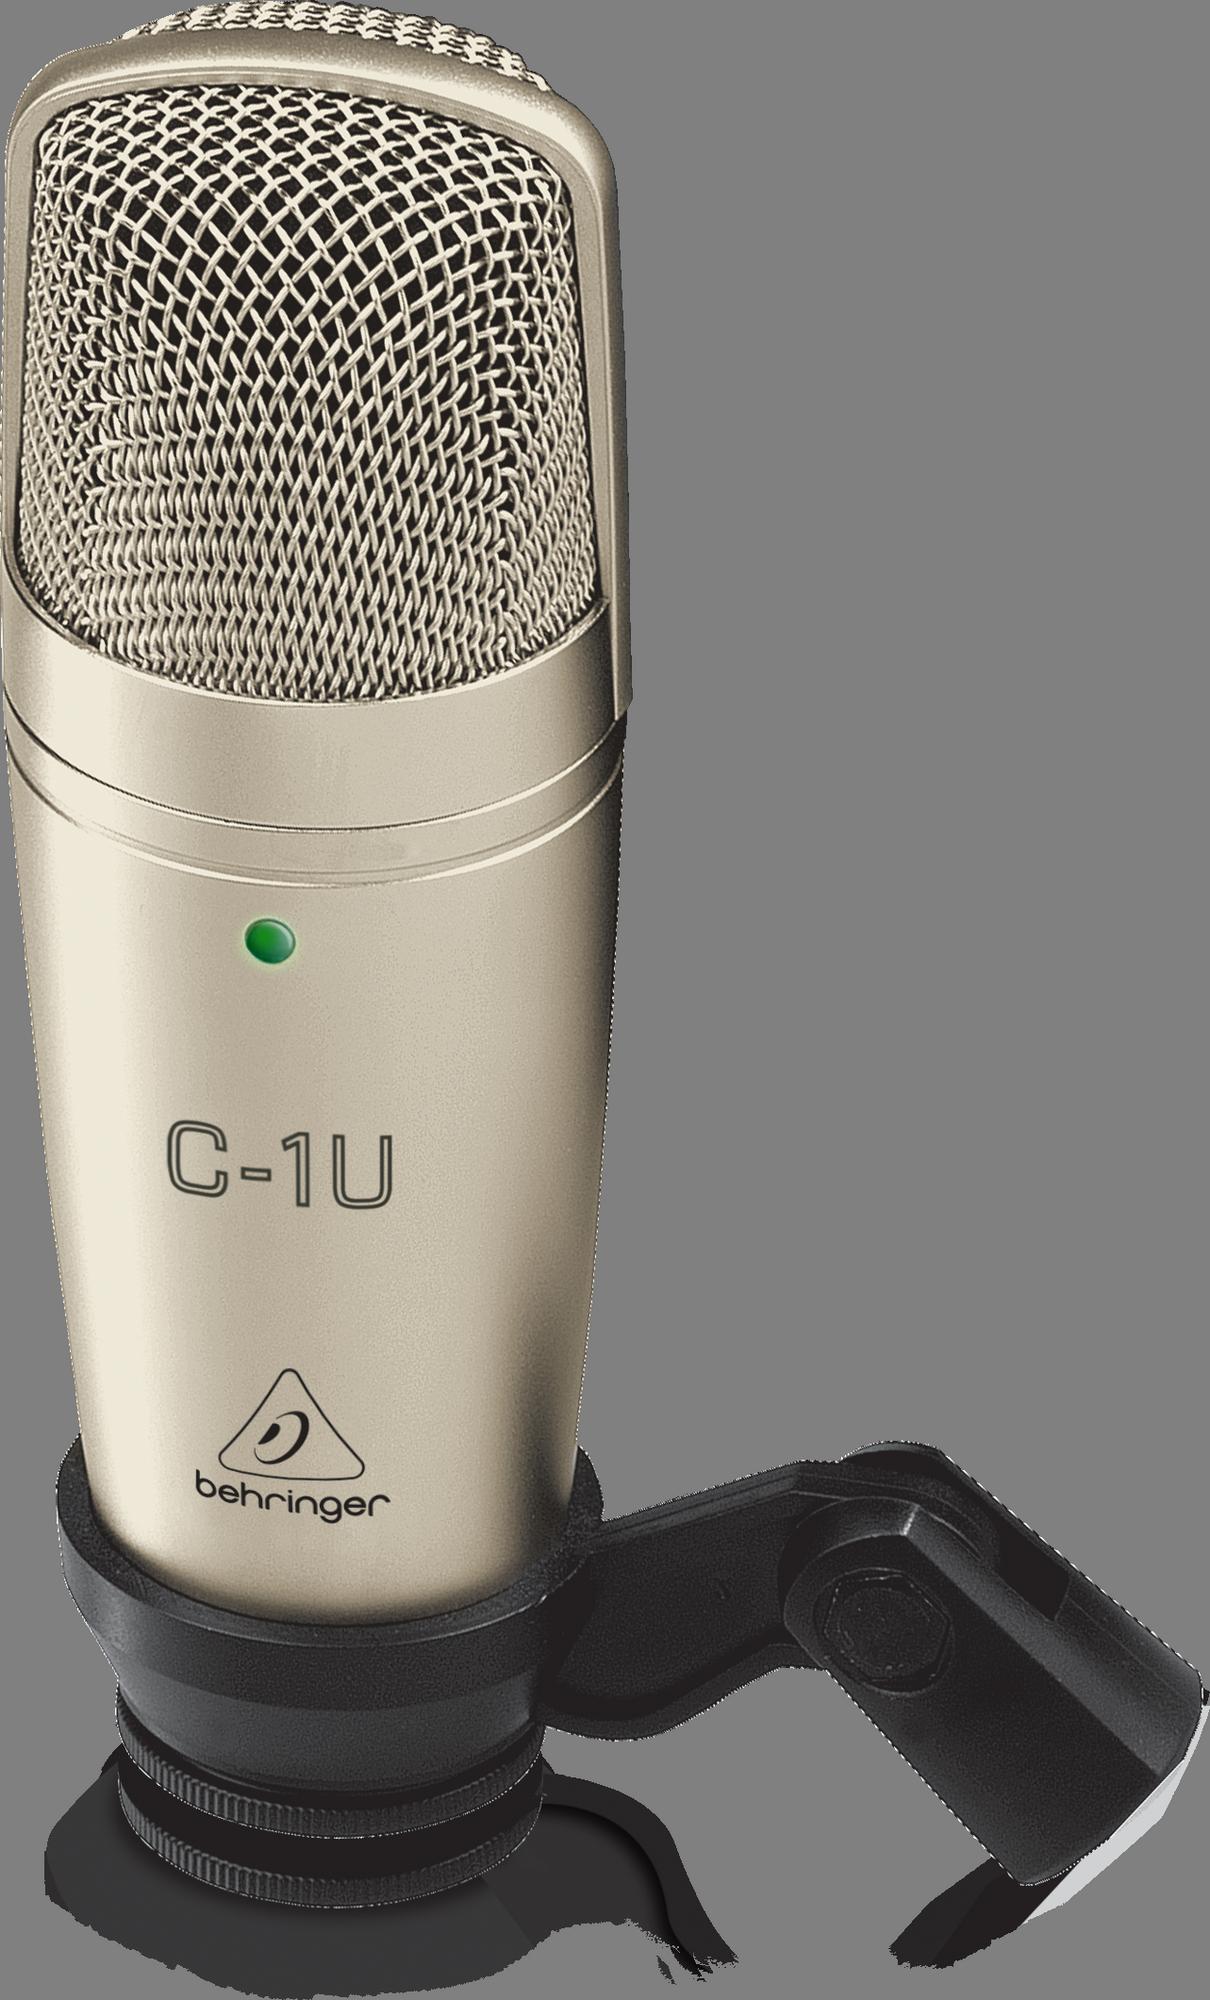 Behringer C-1U - Condenser Microphone USB